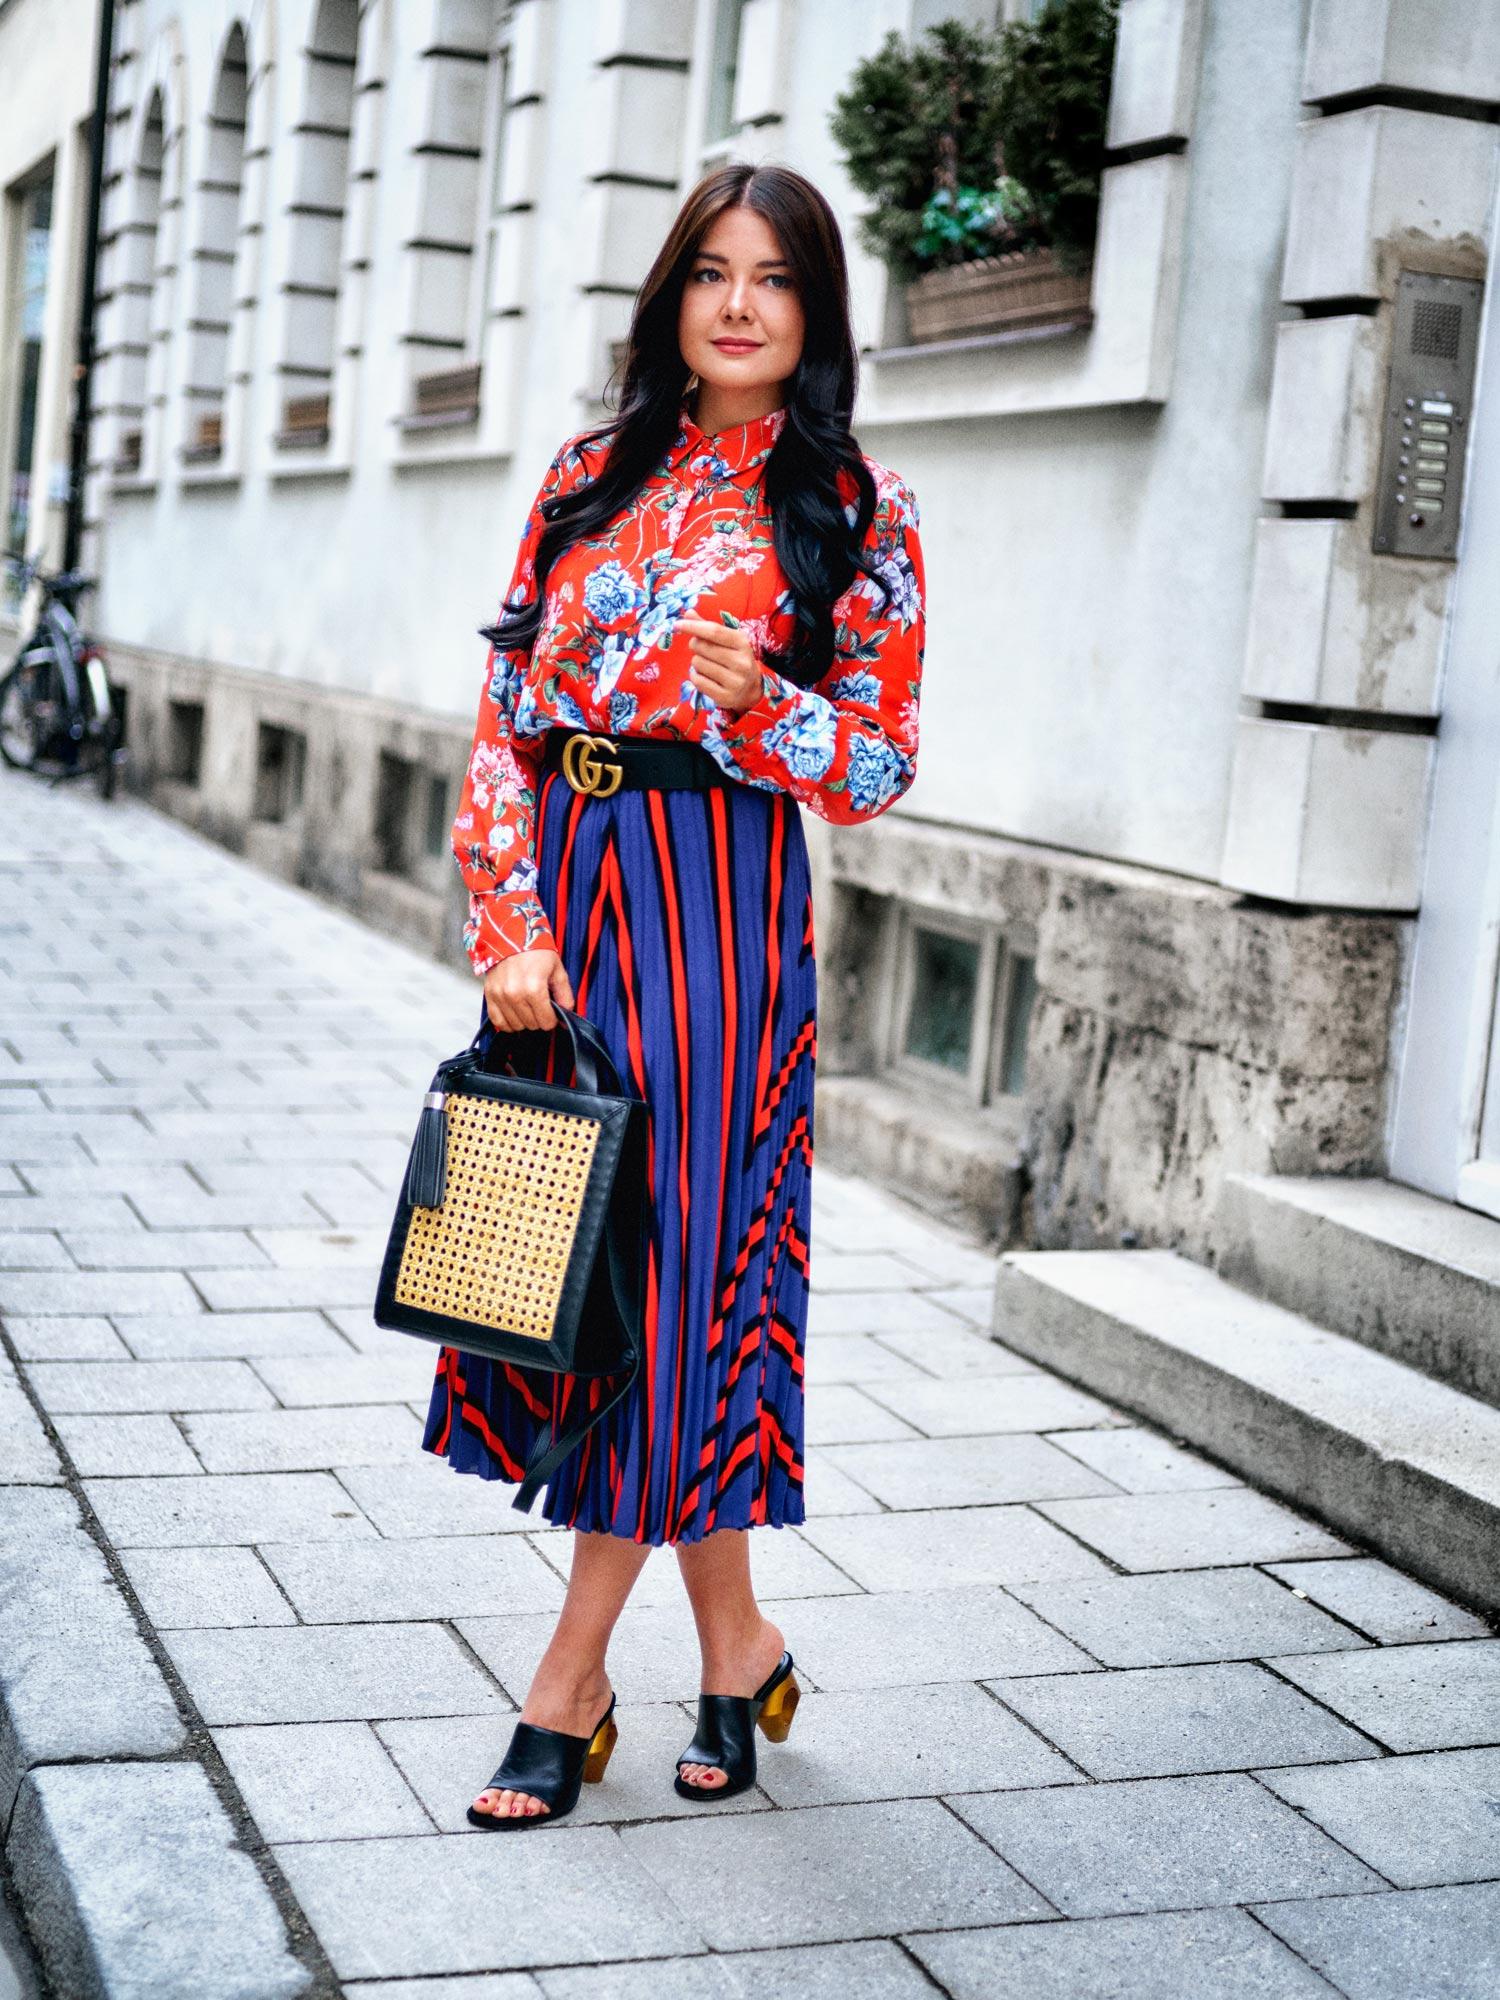 fashion-blogger-aus-muenchen-fashionblogger-lifestyleblogger-beautyblogger-fashion-blogger-modeblogger-modeblog-munich-blog-muenchen-mustermix-alles-ist-erlaubt-so-gelingt-er-perfekt